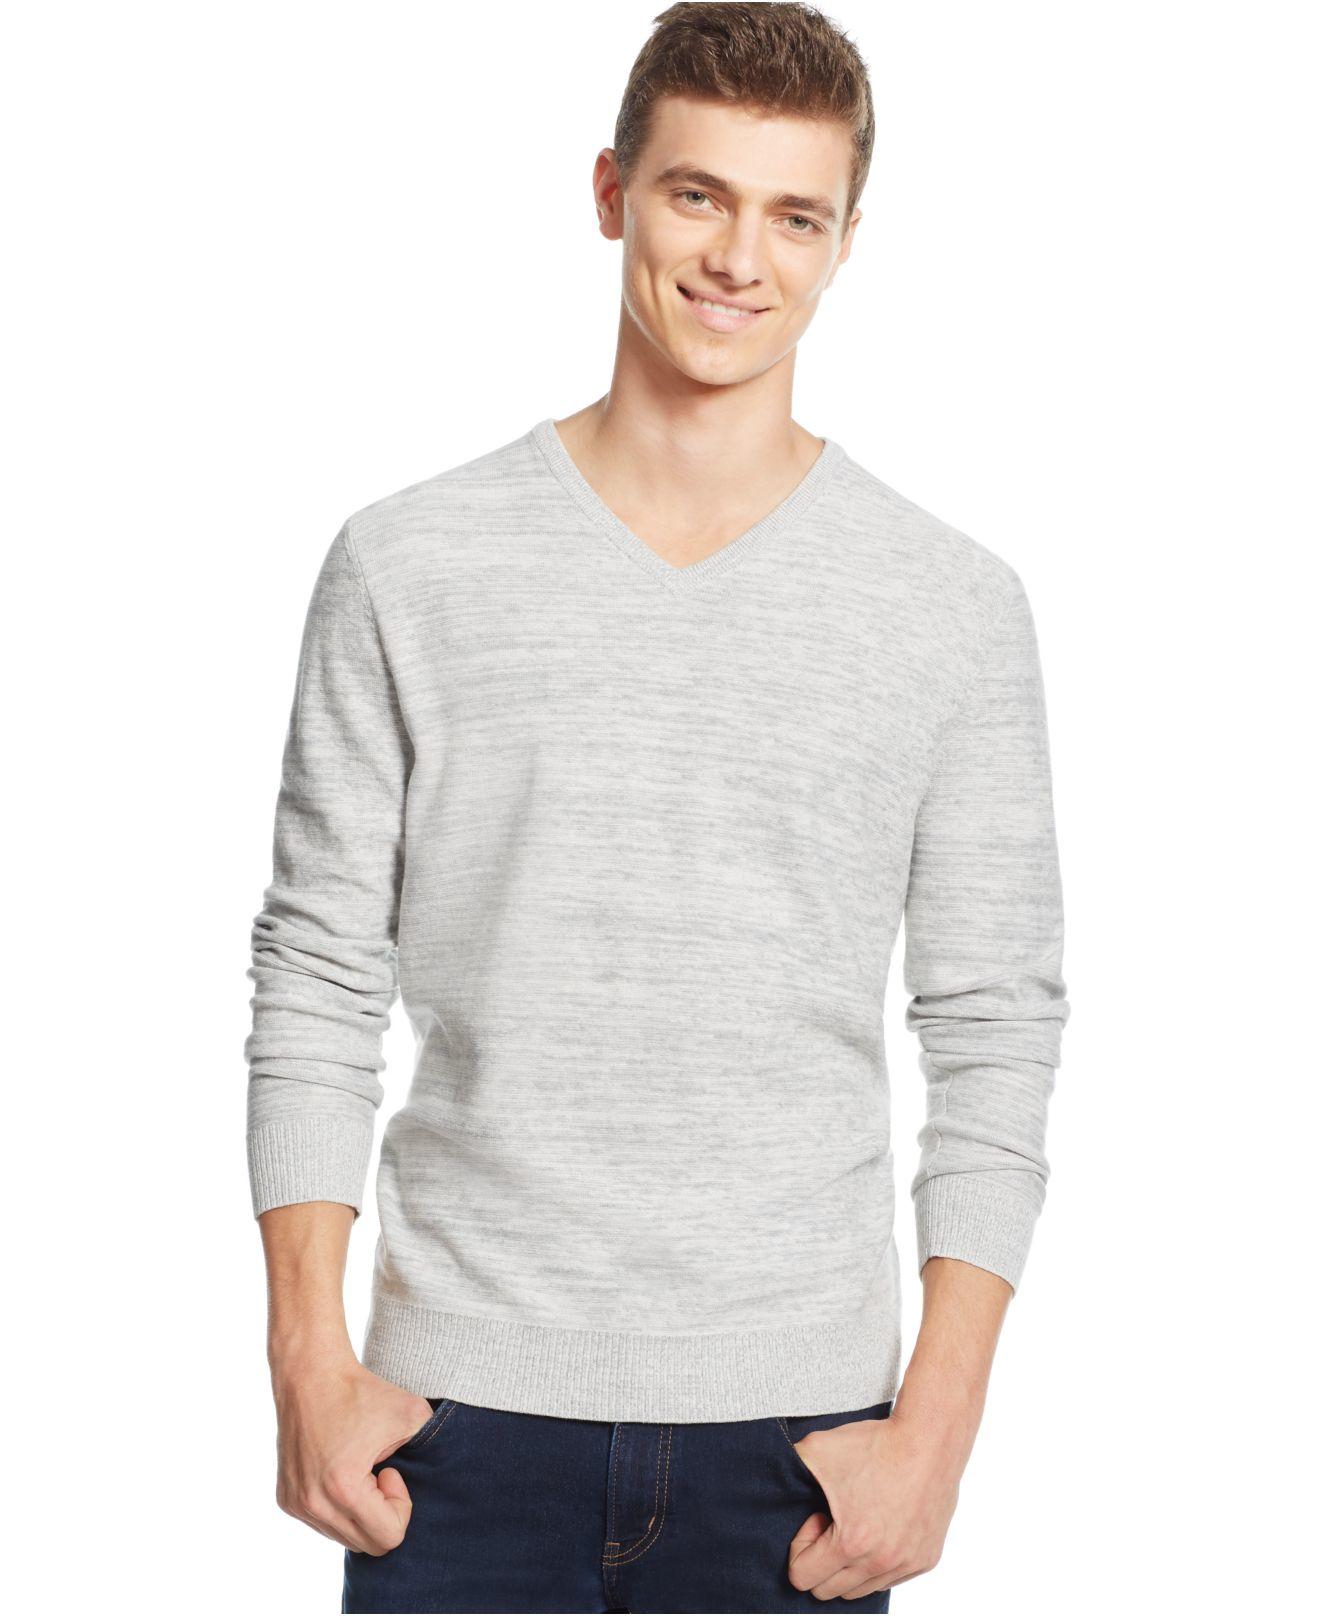 alfani s v neck sweater in gray for lyst